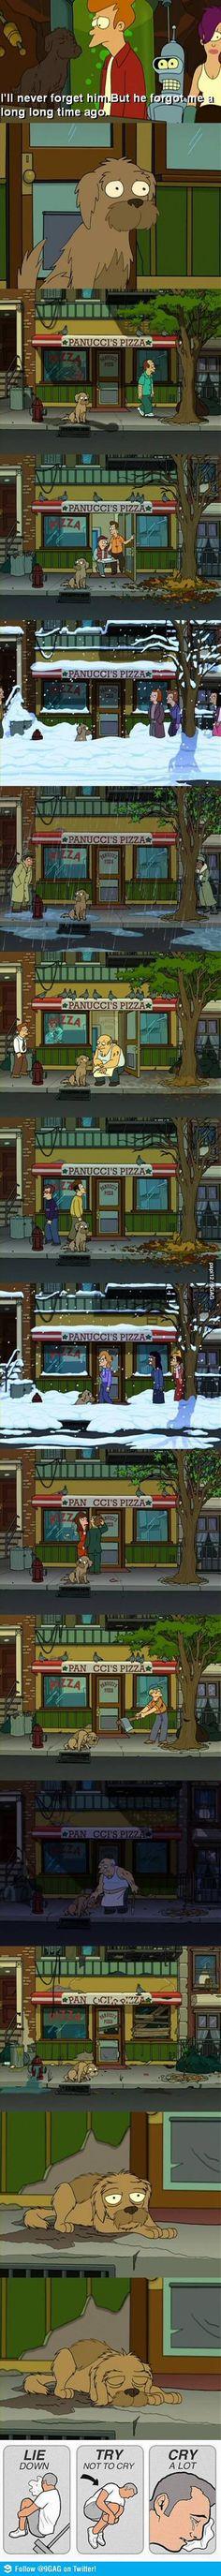 Saddest #Futurama moment - Imgur, It broke my heart #sniff